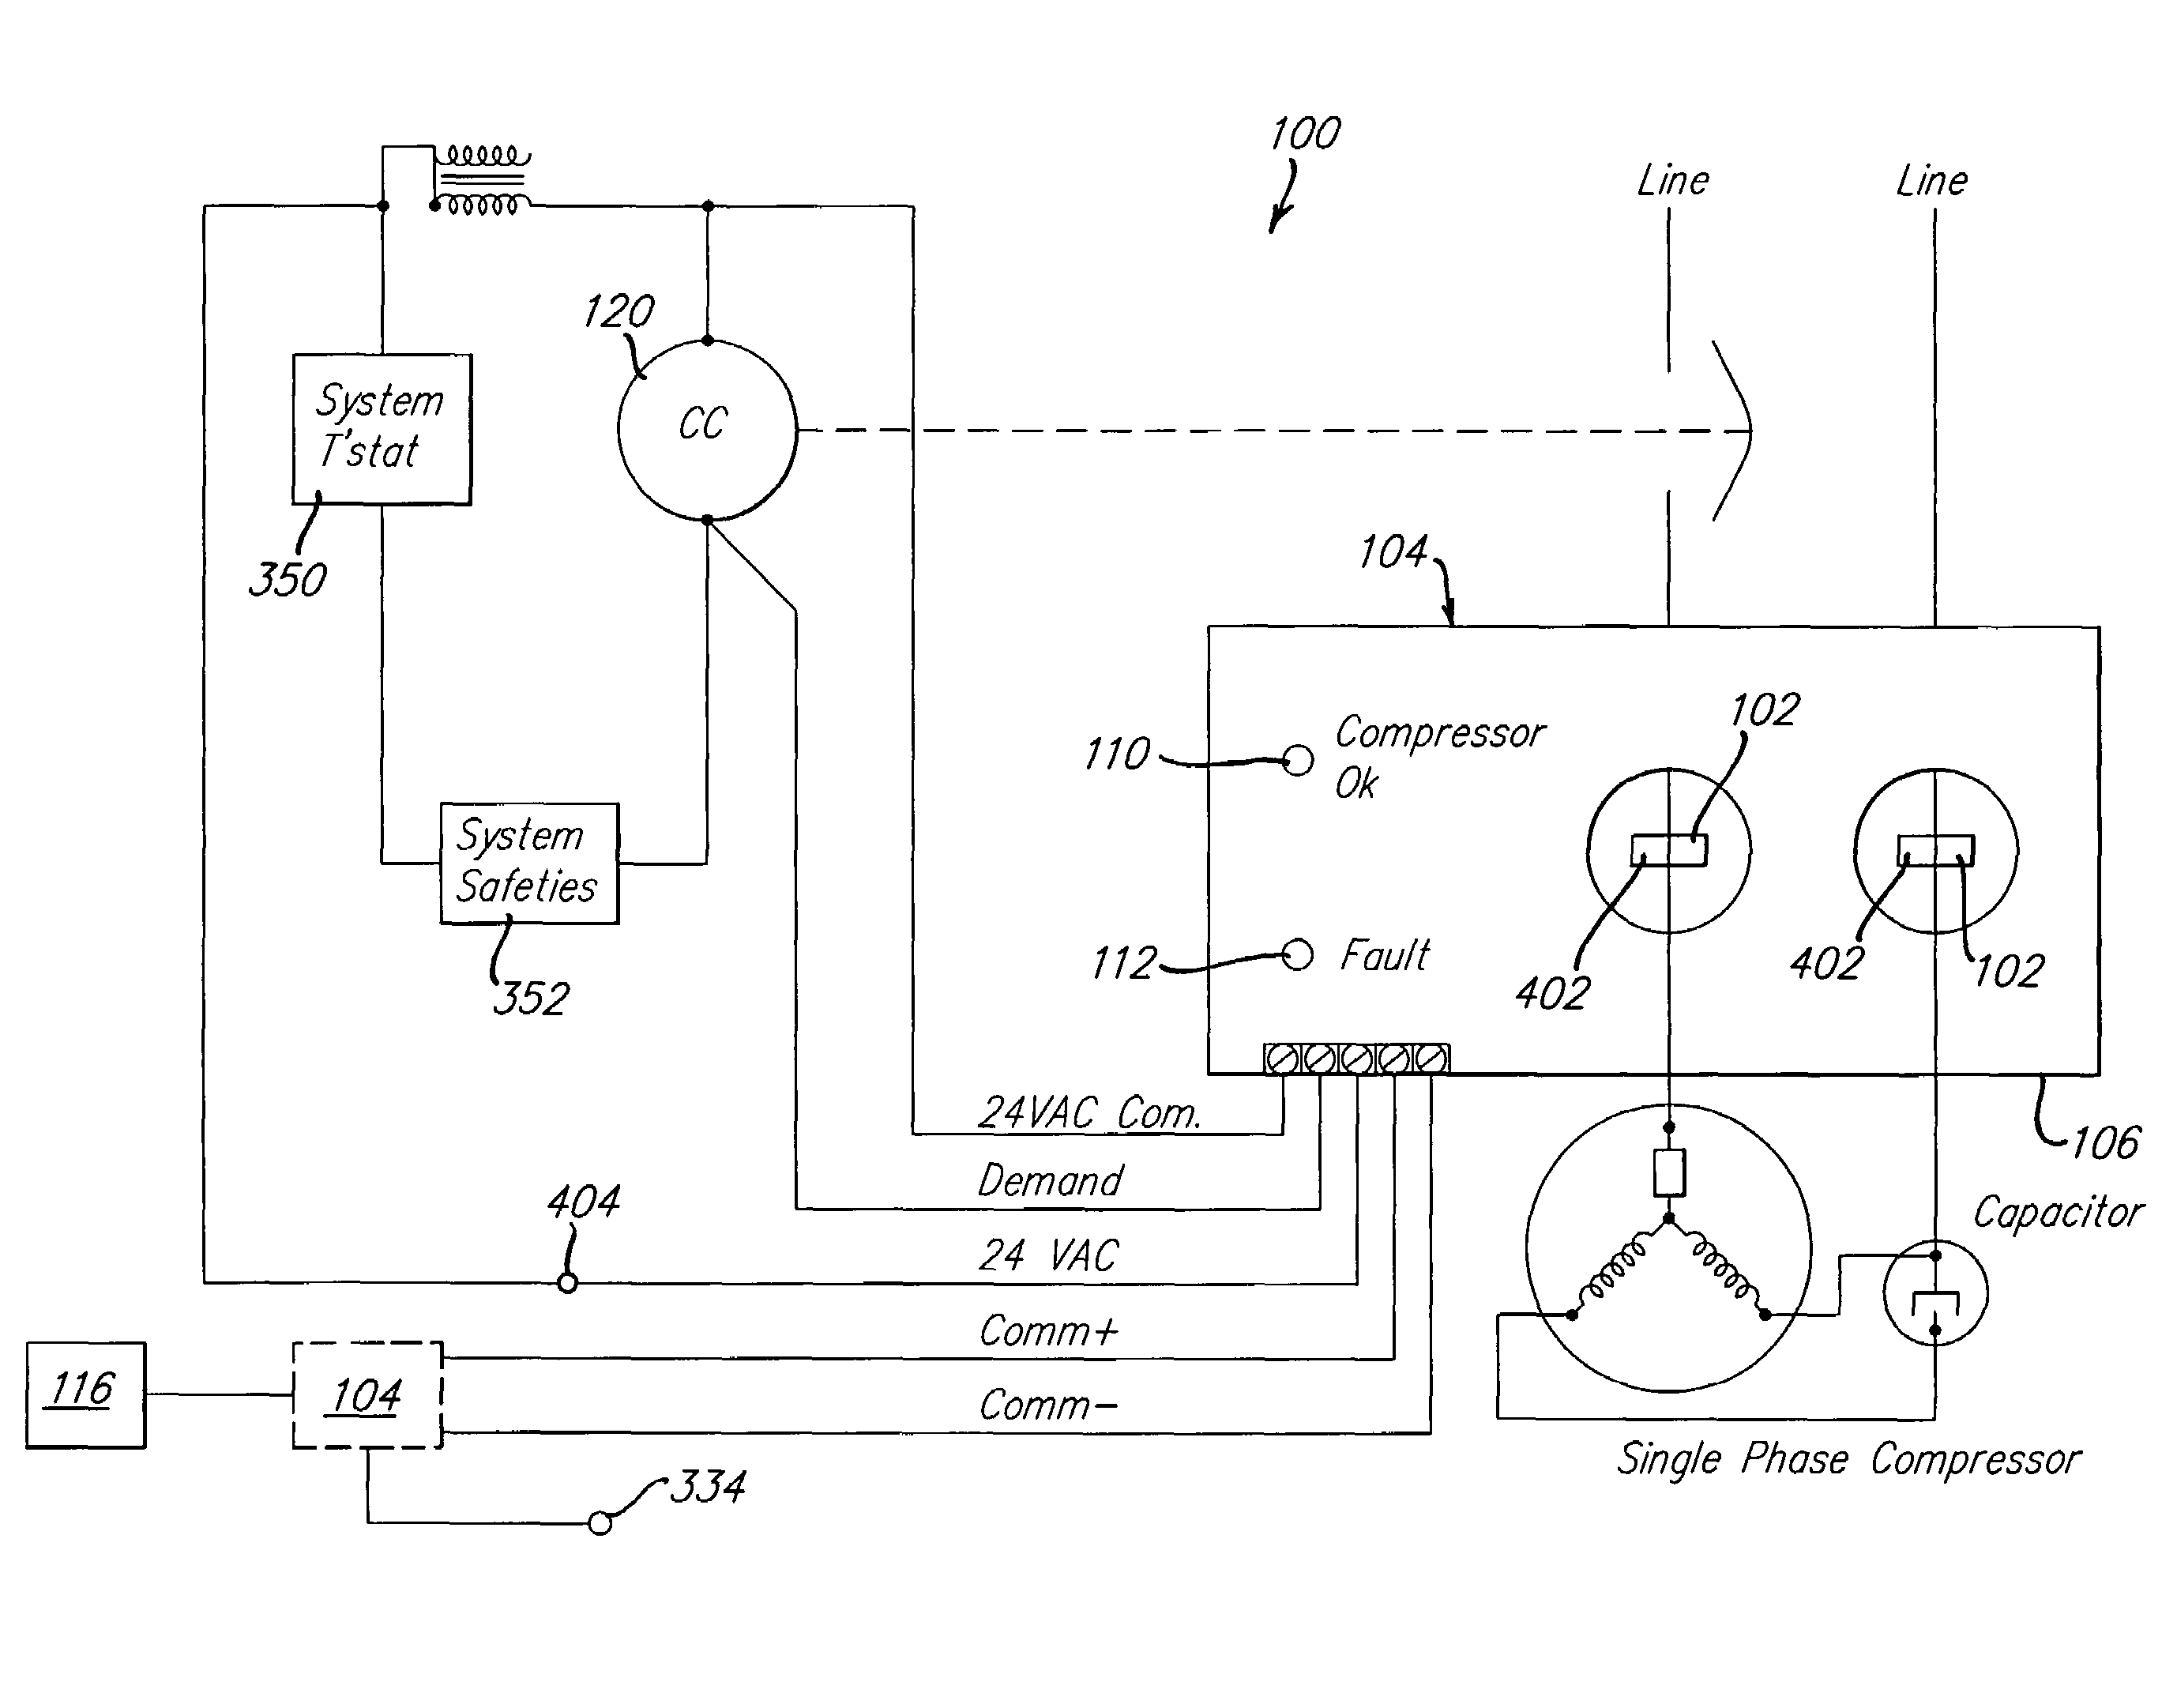 US07647783 20100119 D00000?resize\=665%2C522\&ssl\=1 bitzer condensing unit wiring diagram fan capacitor wiring diagram bitzer compressor wiring diagram at mifinder.co